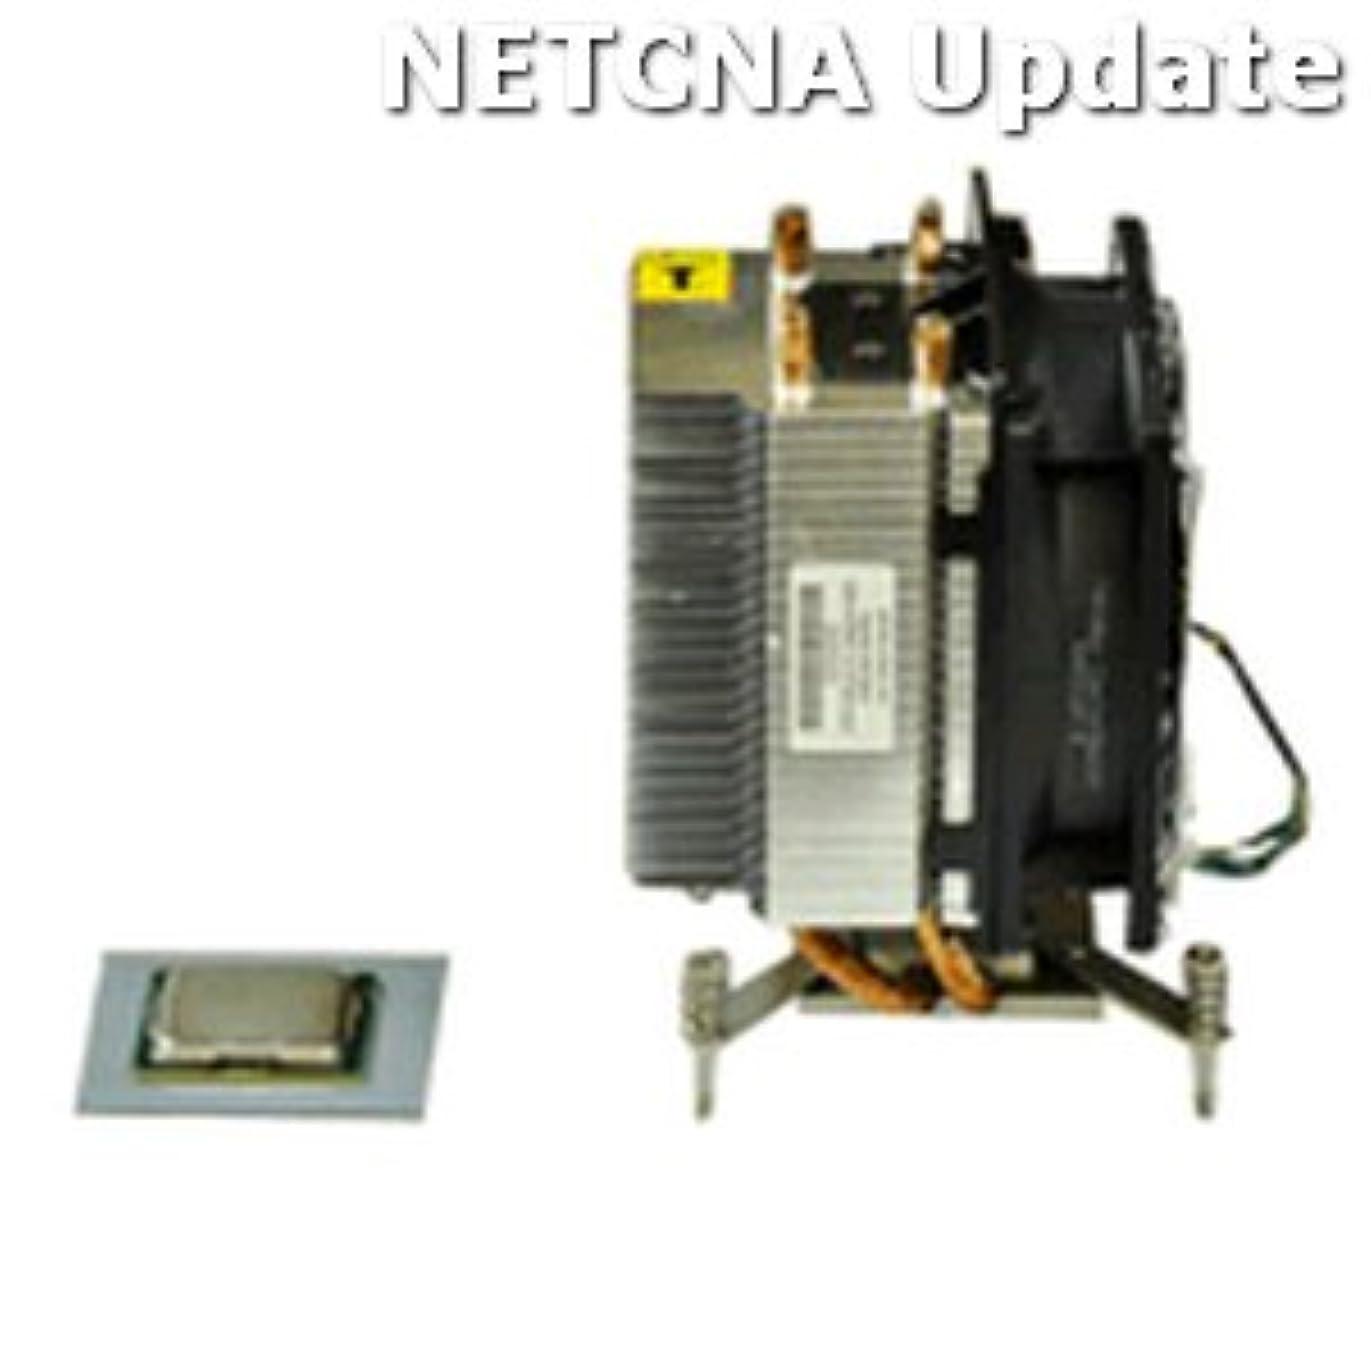 田舎者湾スリラー643290-b21 HP Xeon i3 – 2120 3.30 GHz ml110 g7互換製品by NETCNA